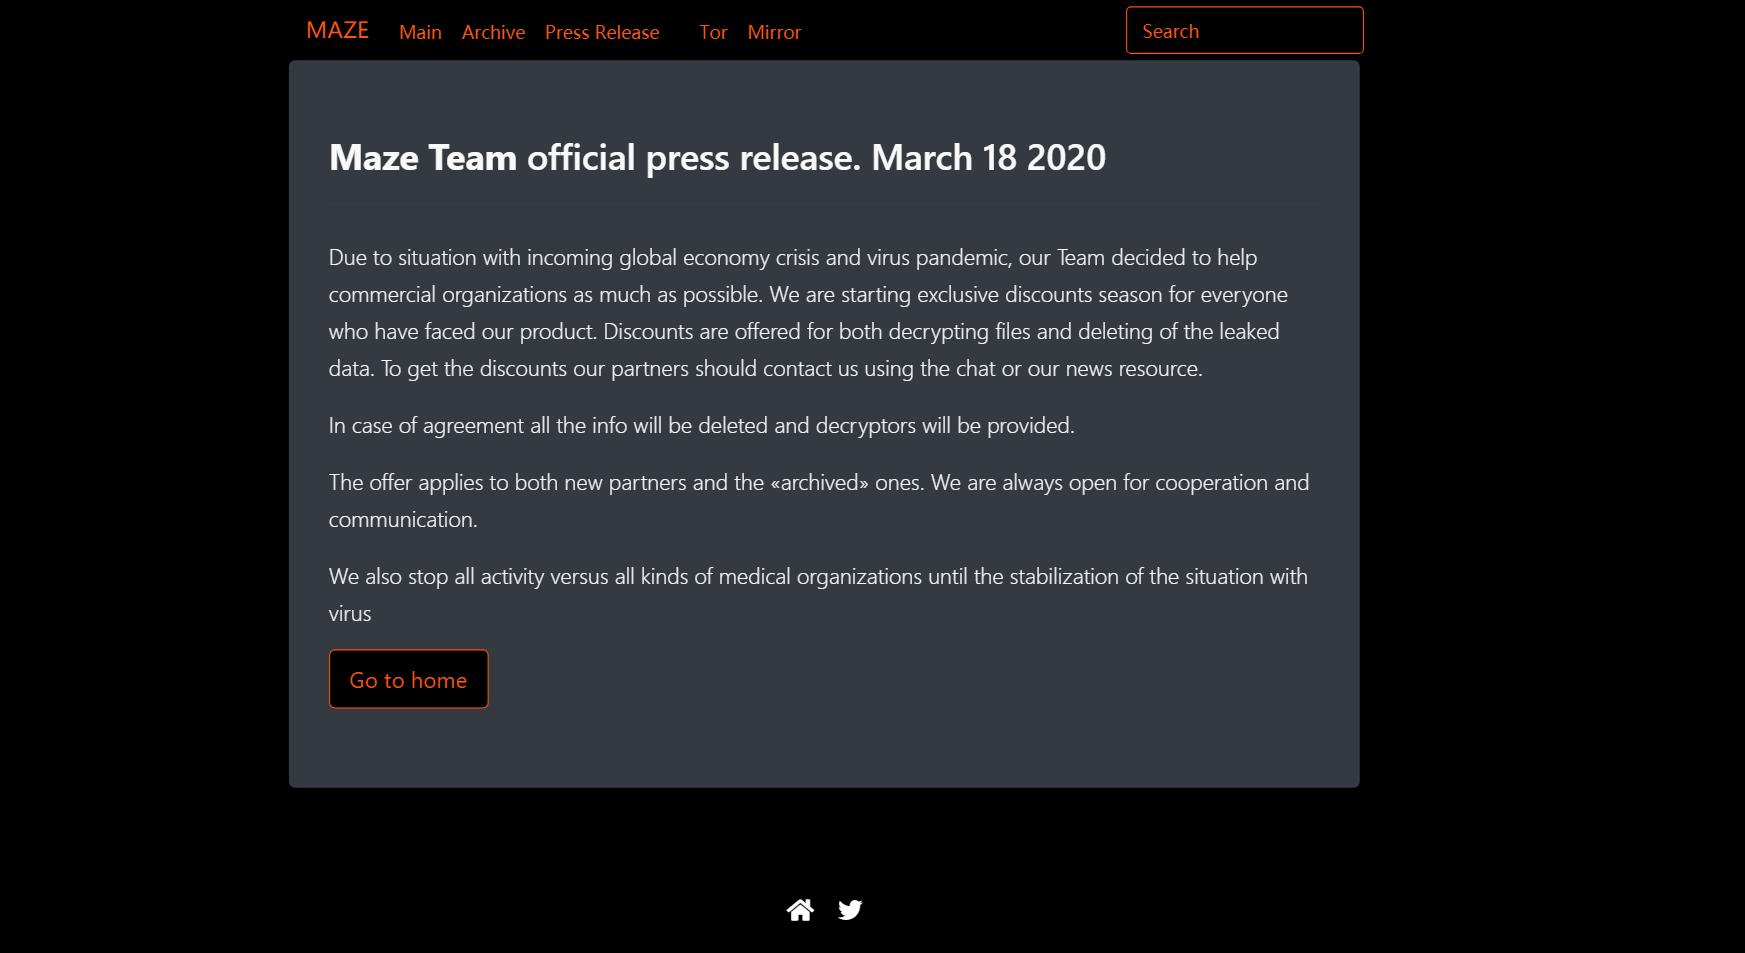 Maze Team Press Release